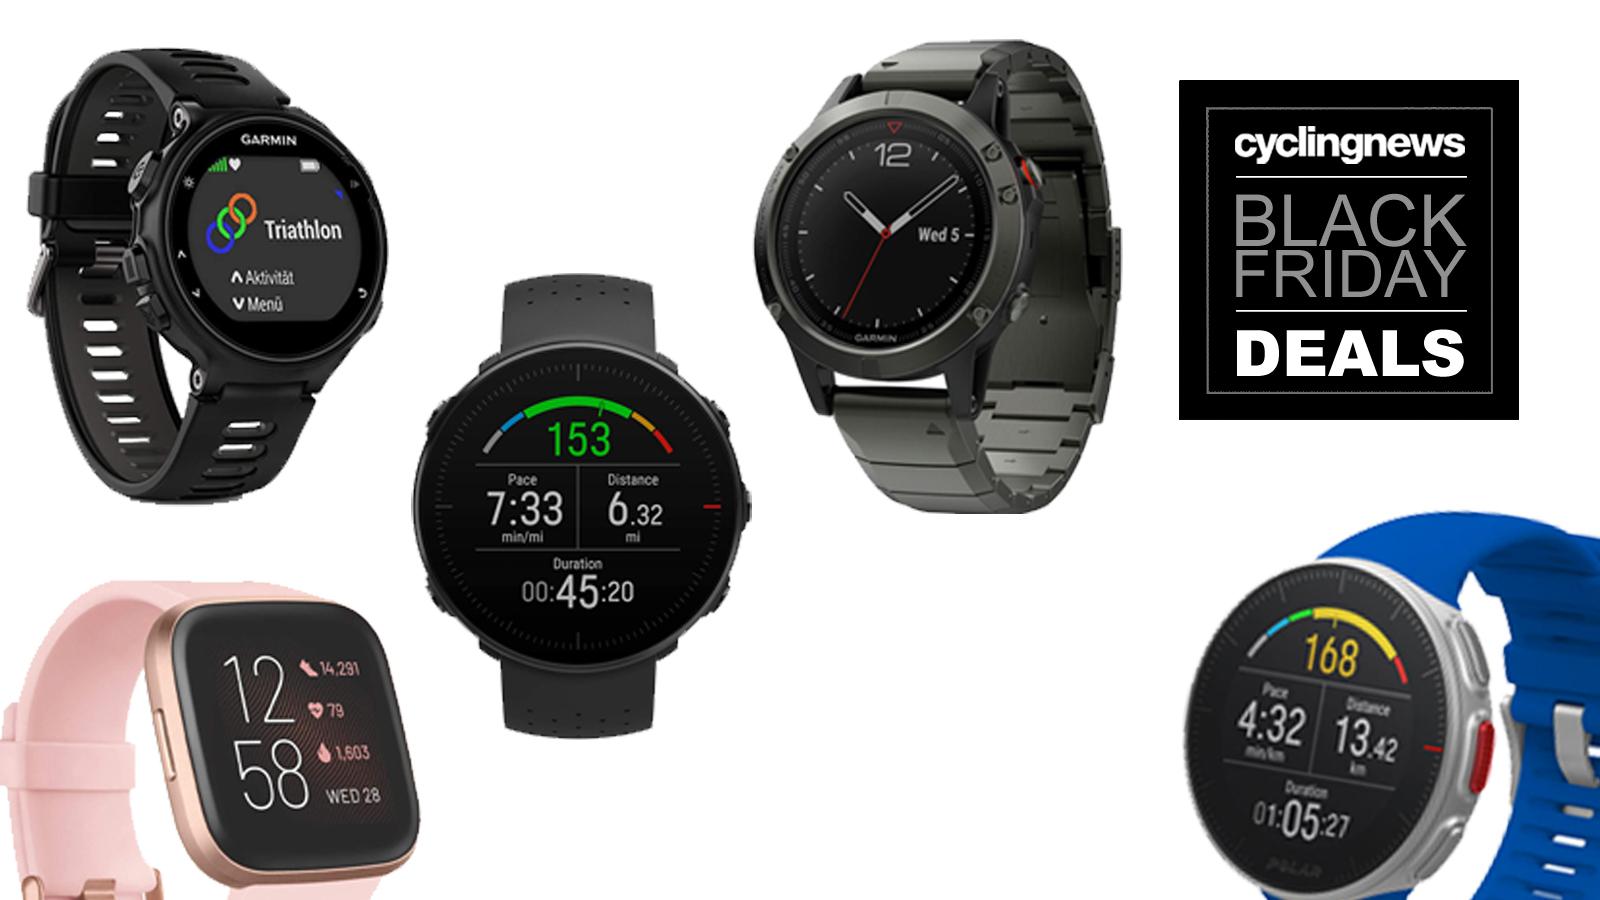 Black Friday Smartwatch Deals 2020 Huge Black Friday Savings On Garmin Suunto Polar And More Cyclingnews